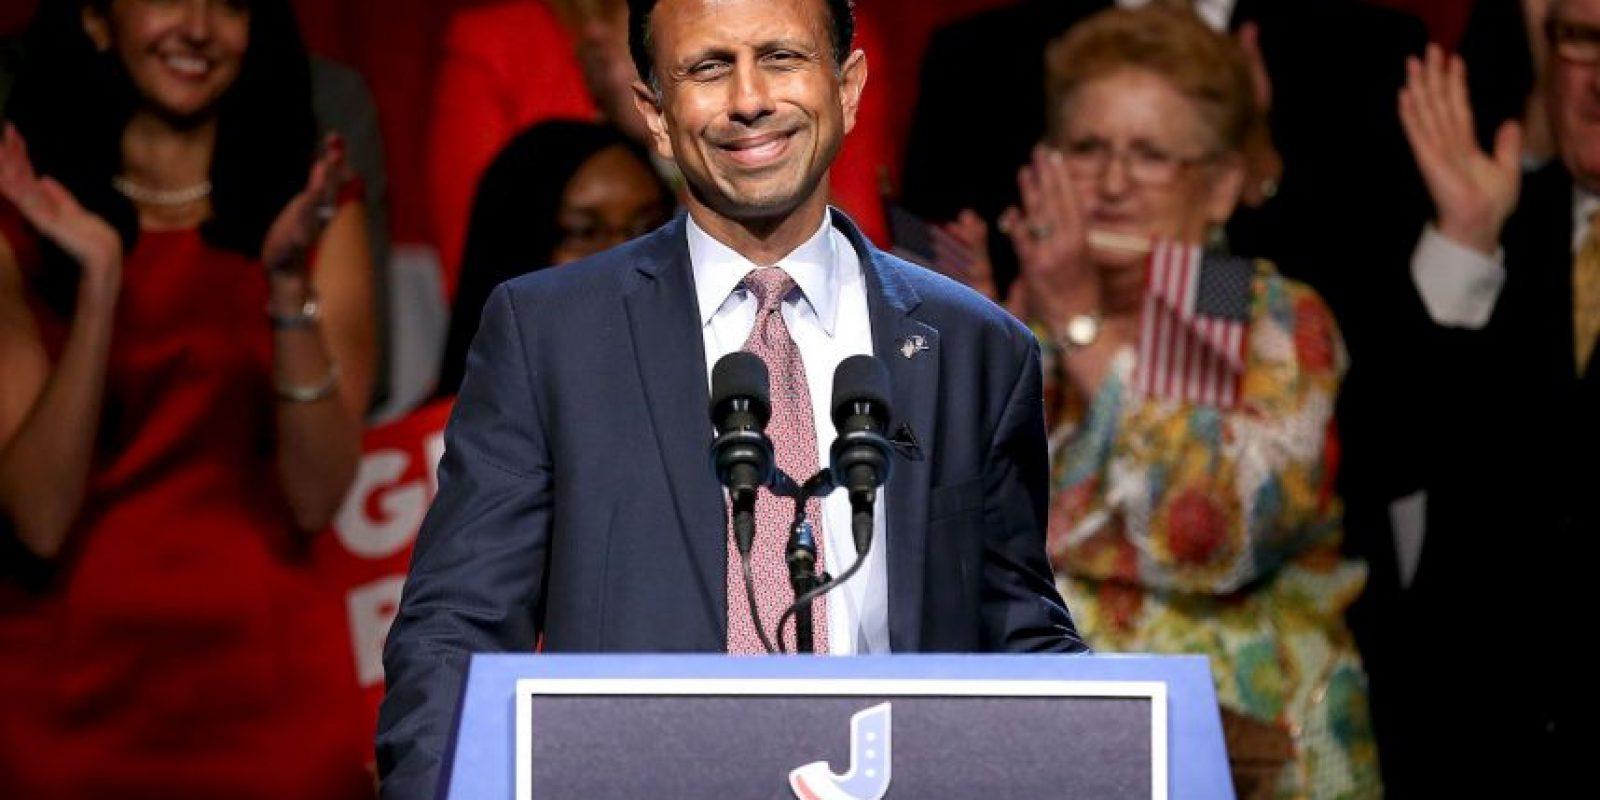 Bobby Jindal, gobernador de Luisiana Foto:Getty Images